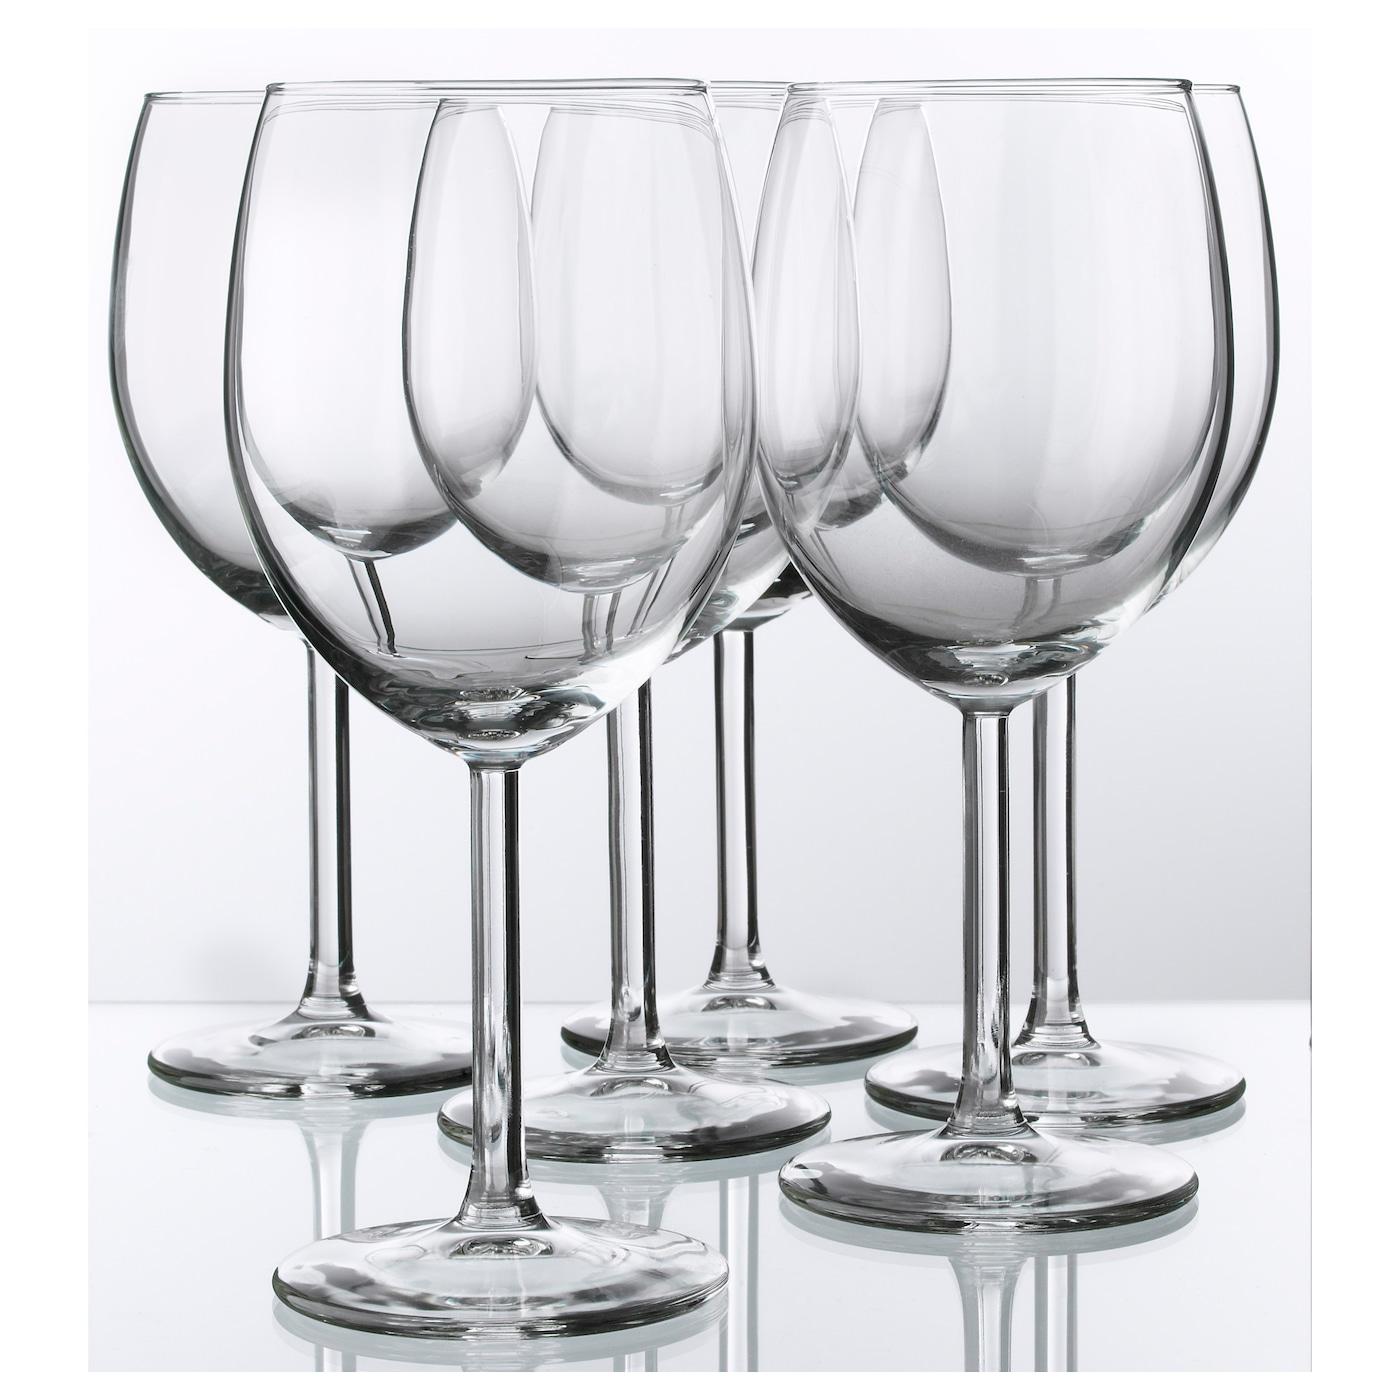 ikea glasses cups mugs ikea ireland dublin. Black Bedroom Furniture Sets. Home Design Ideas